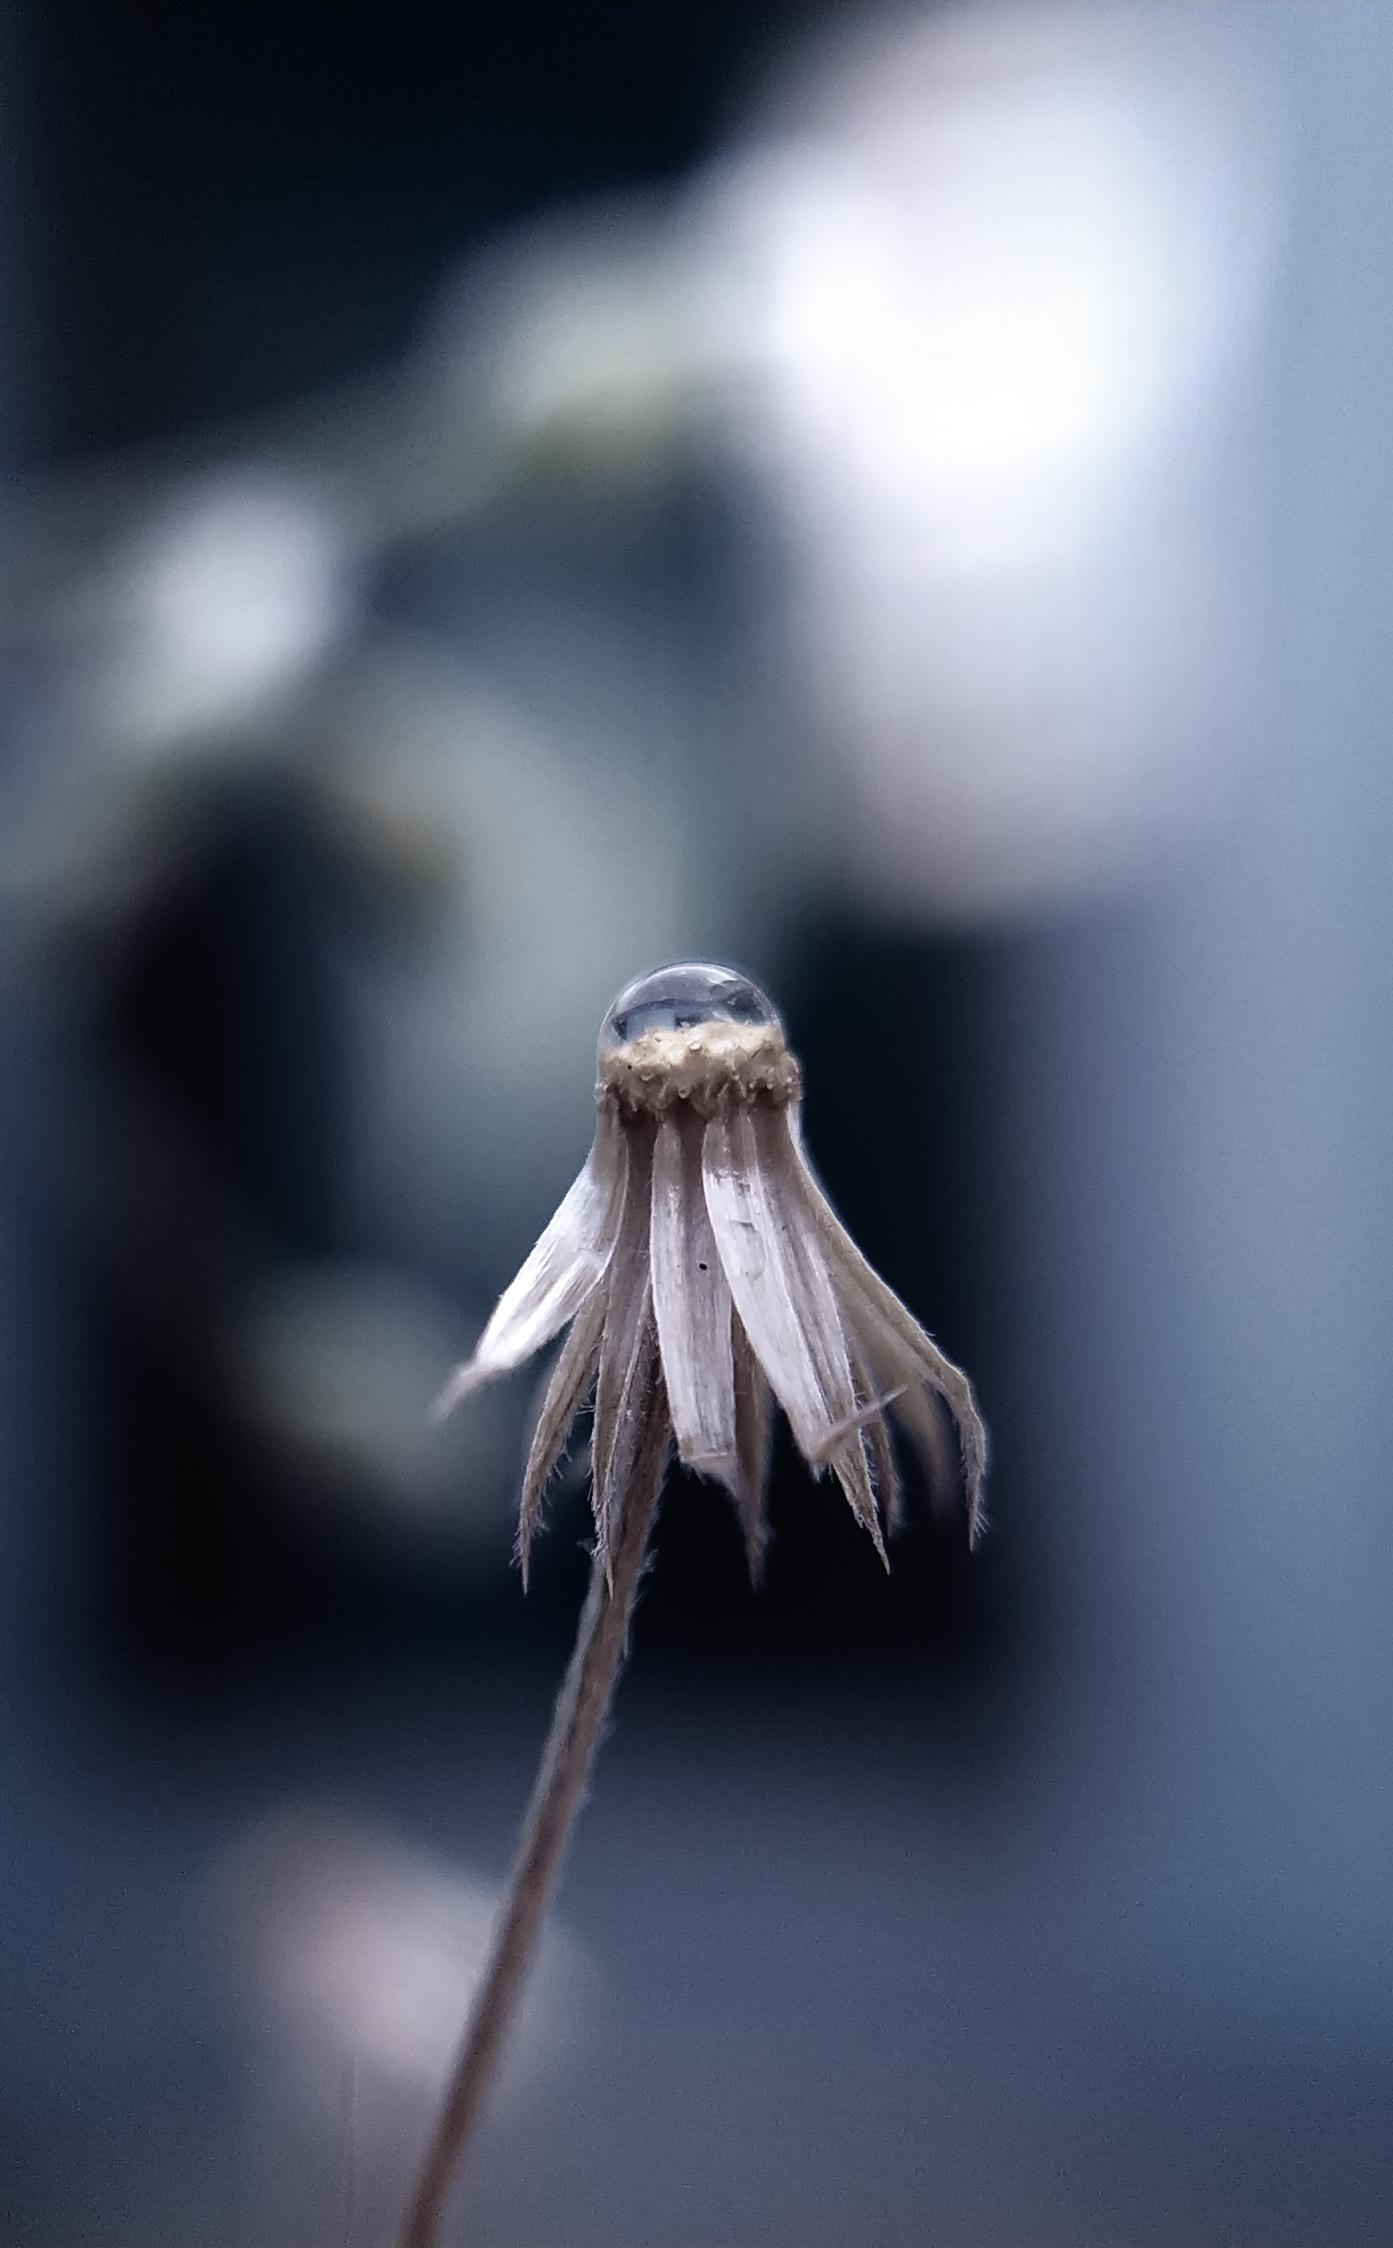 Water drops on dried flower